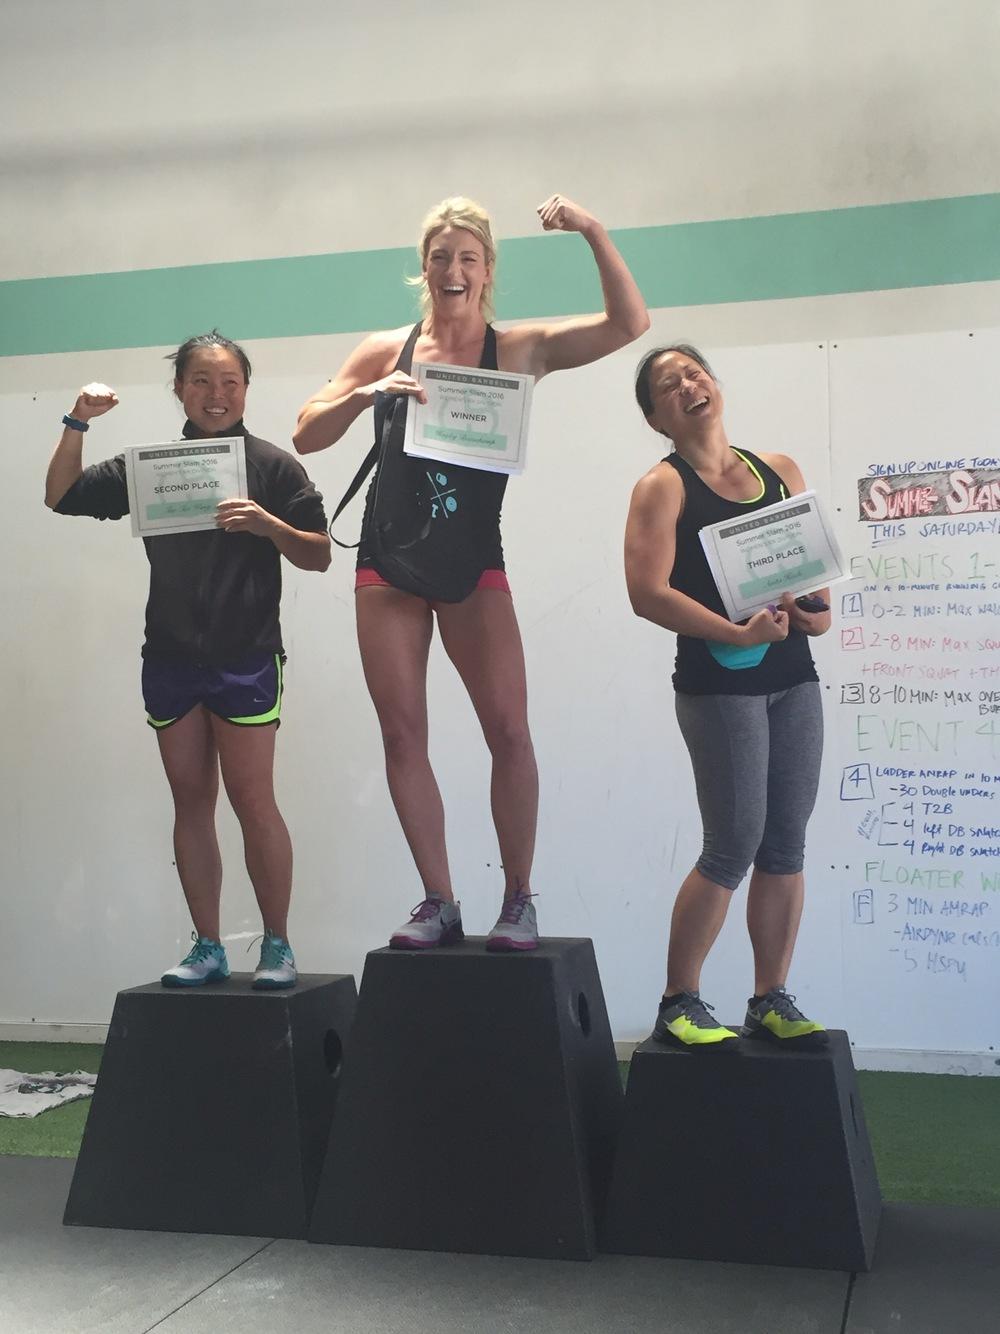 RX Ladies: 1st - Hayley, 2nd - Tao Tao, 3rd - Anita